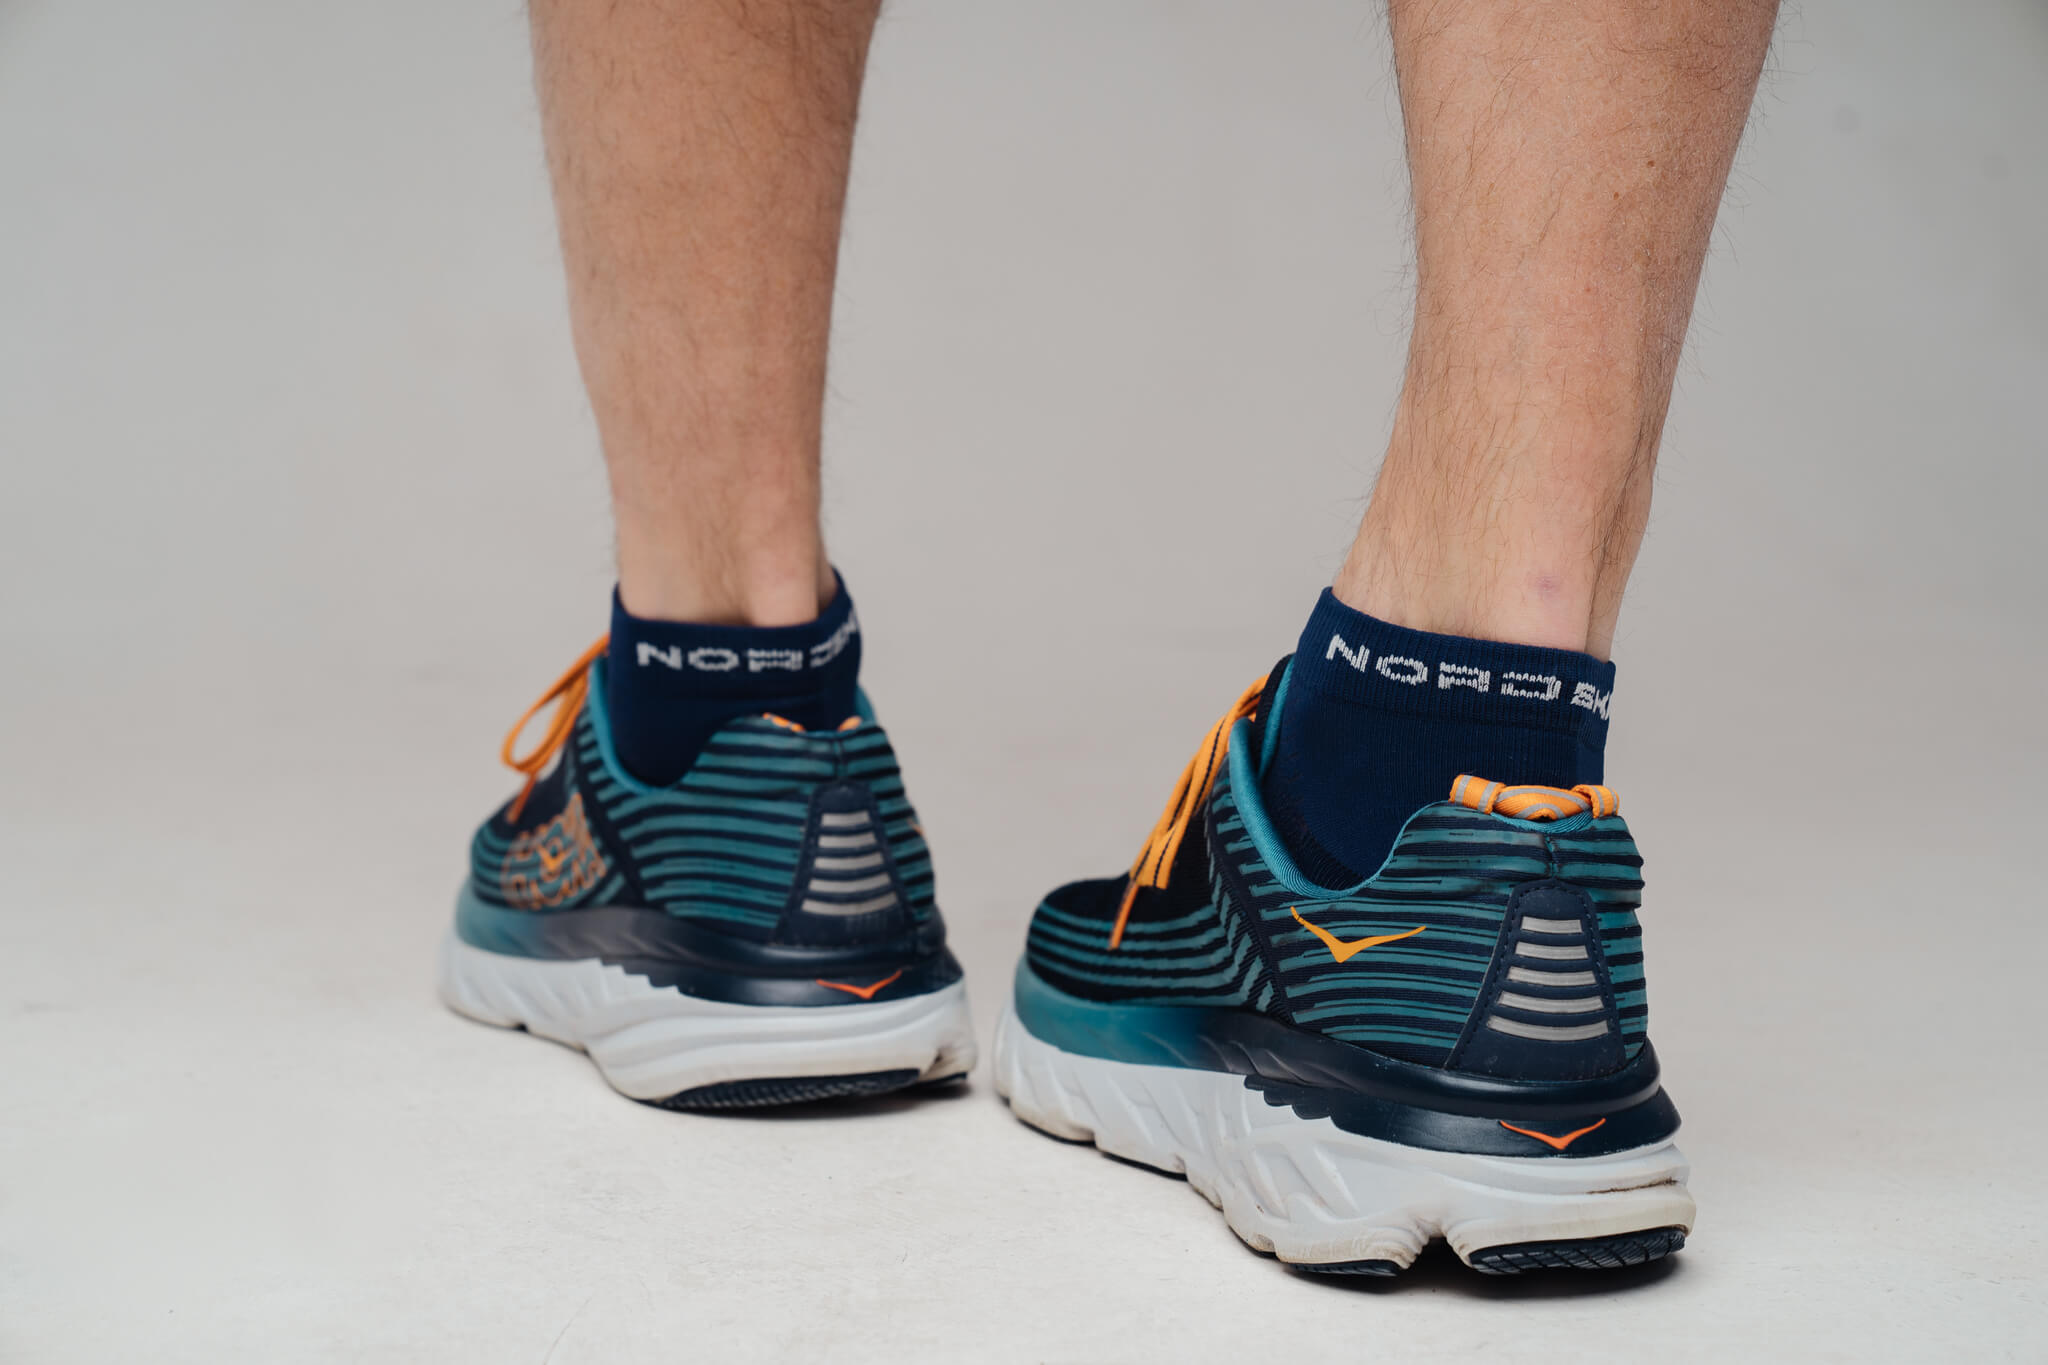 Nordski Run комплект спортивные носки black-seaport - 2